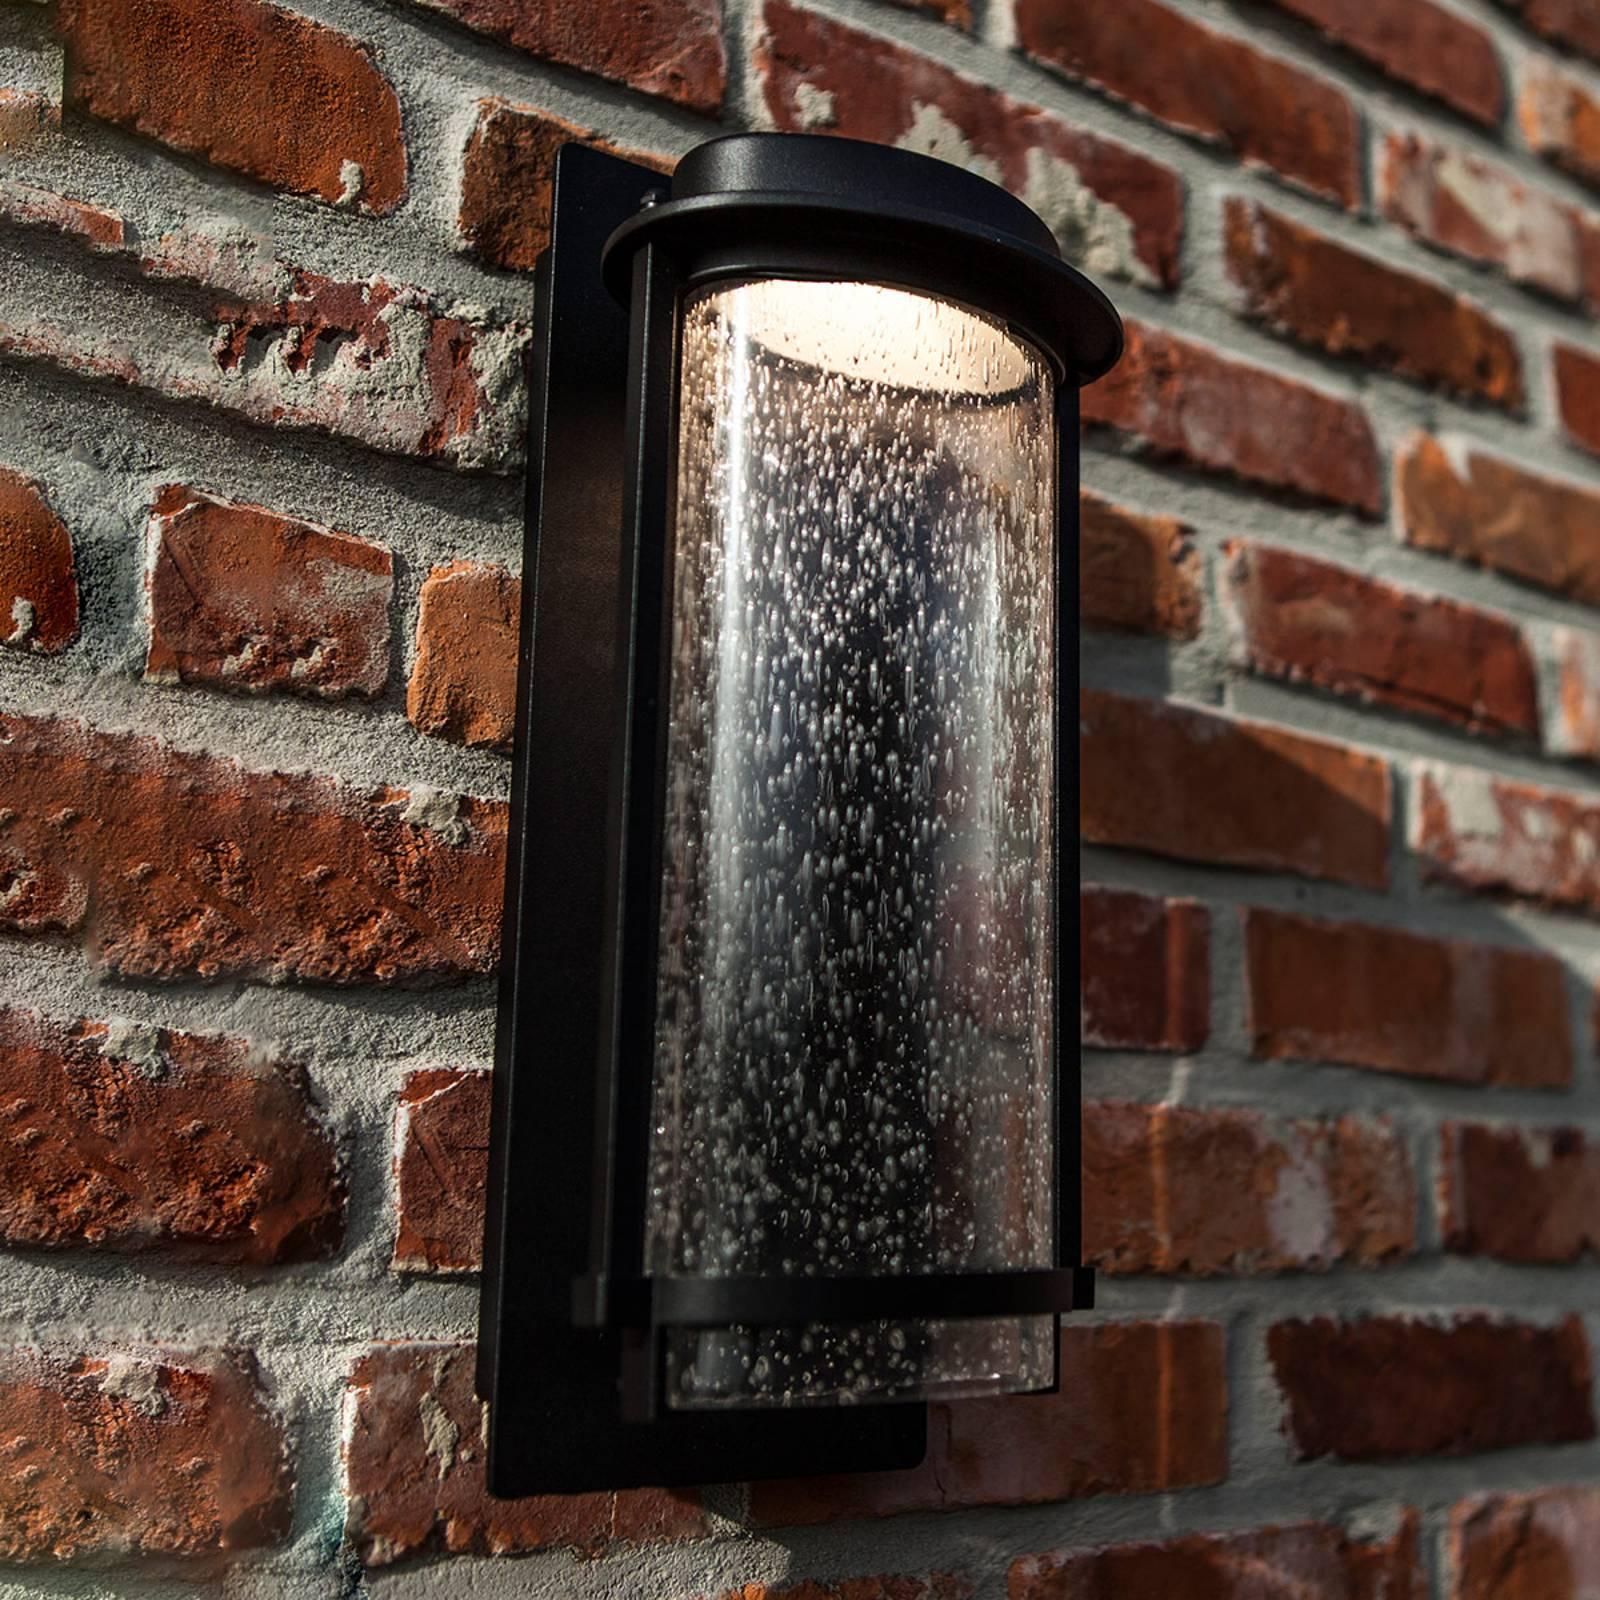 LED buitenwandlamp Aquarius met luchtinsluitingen